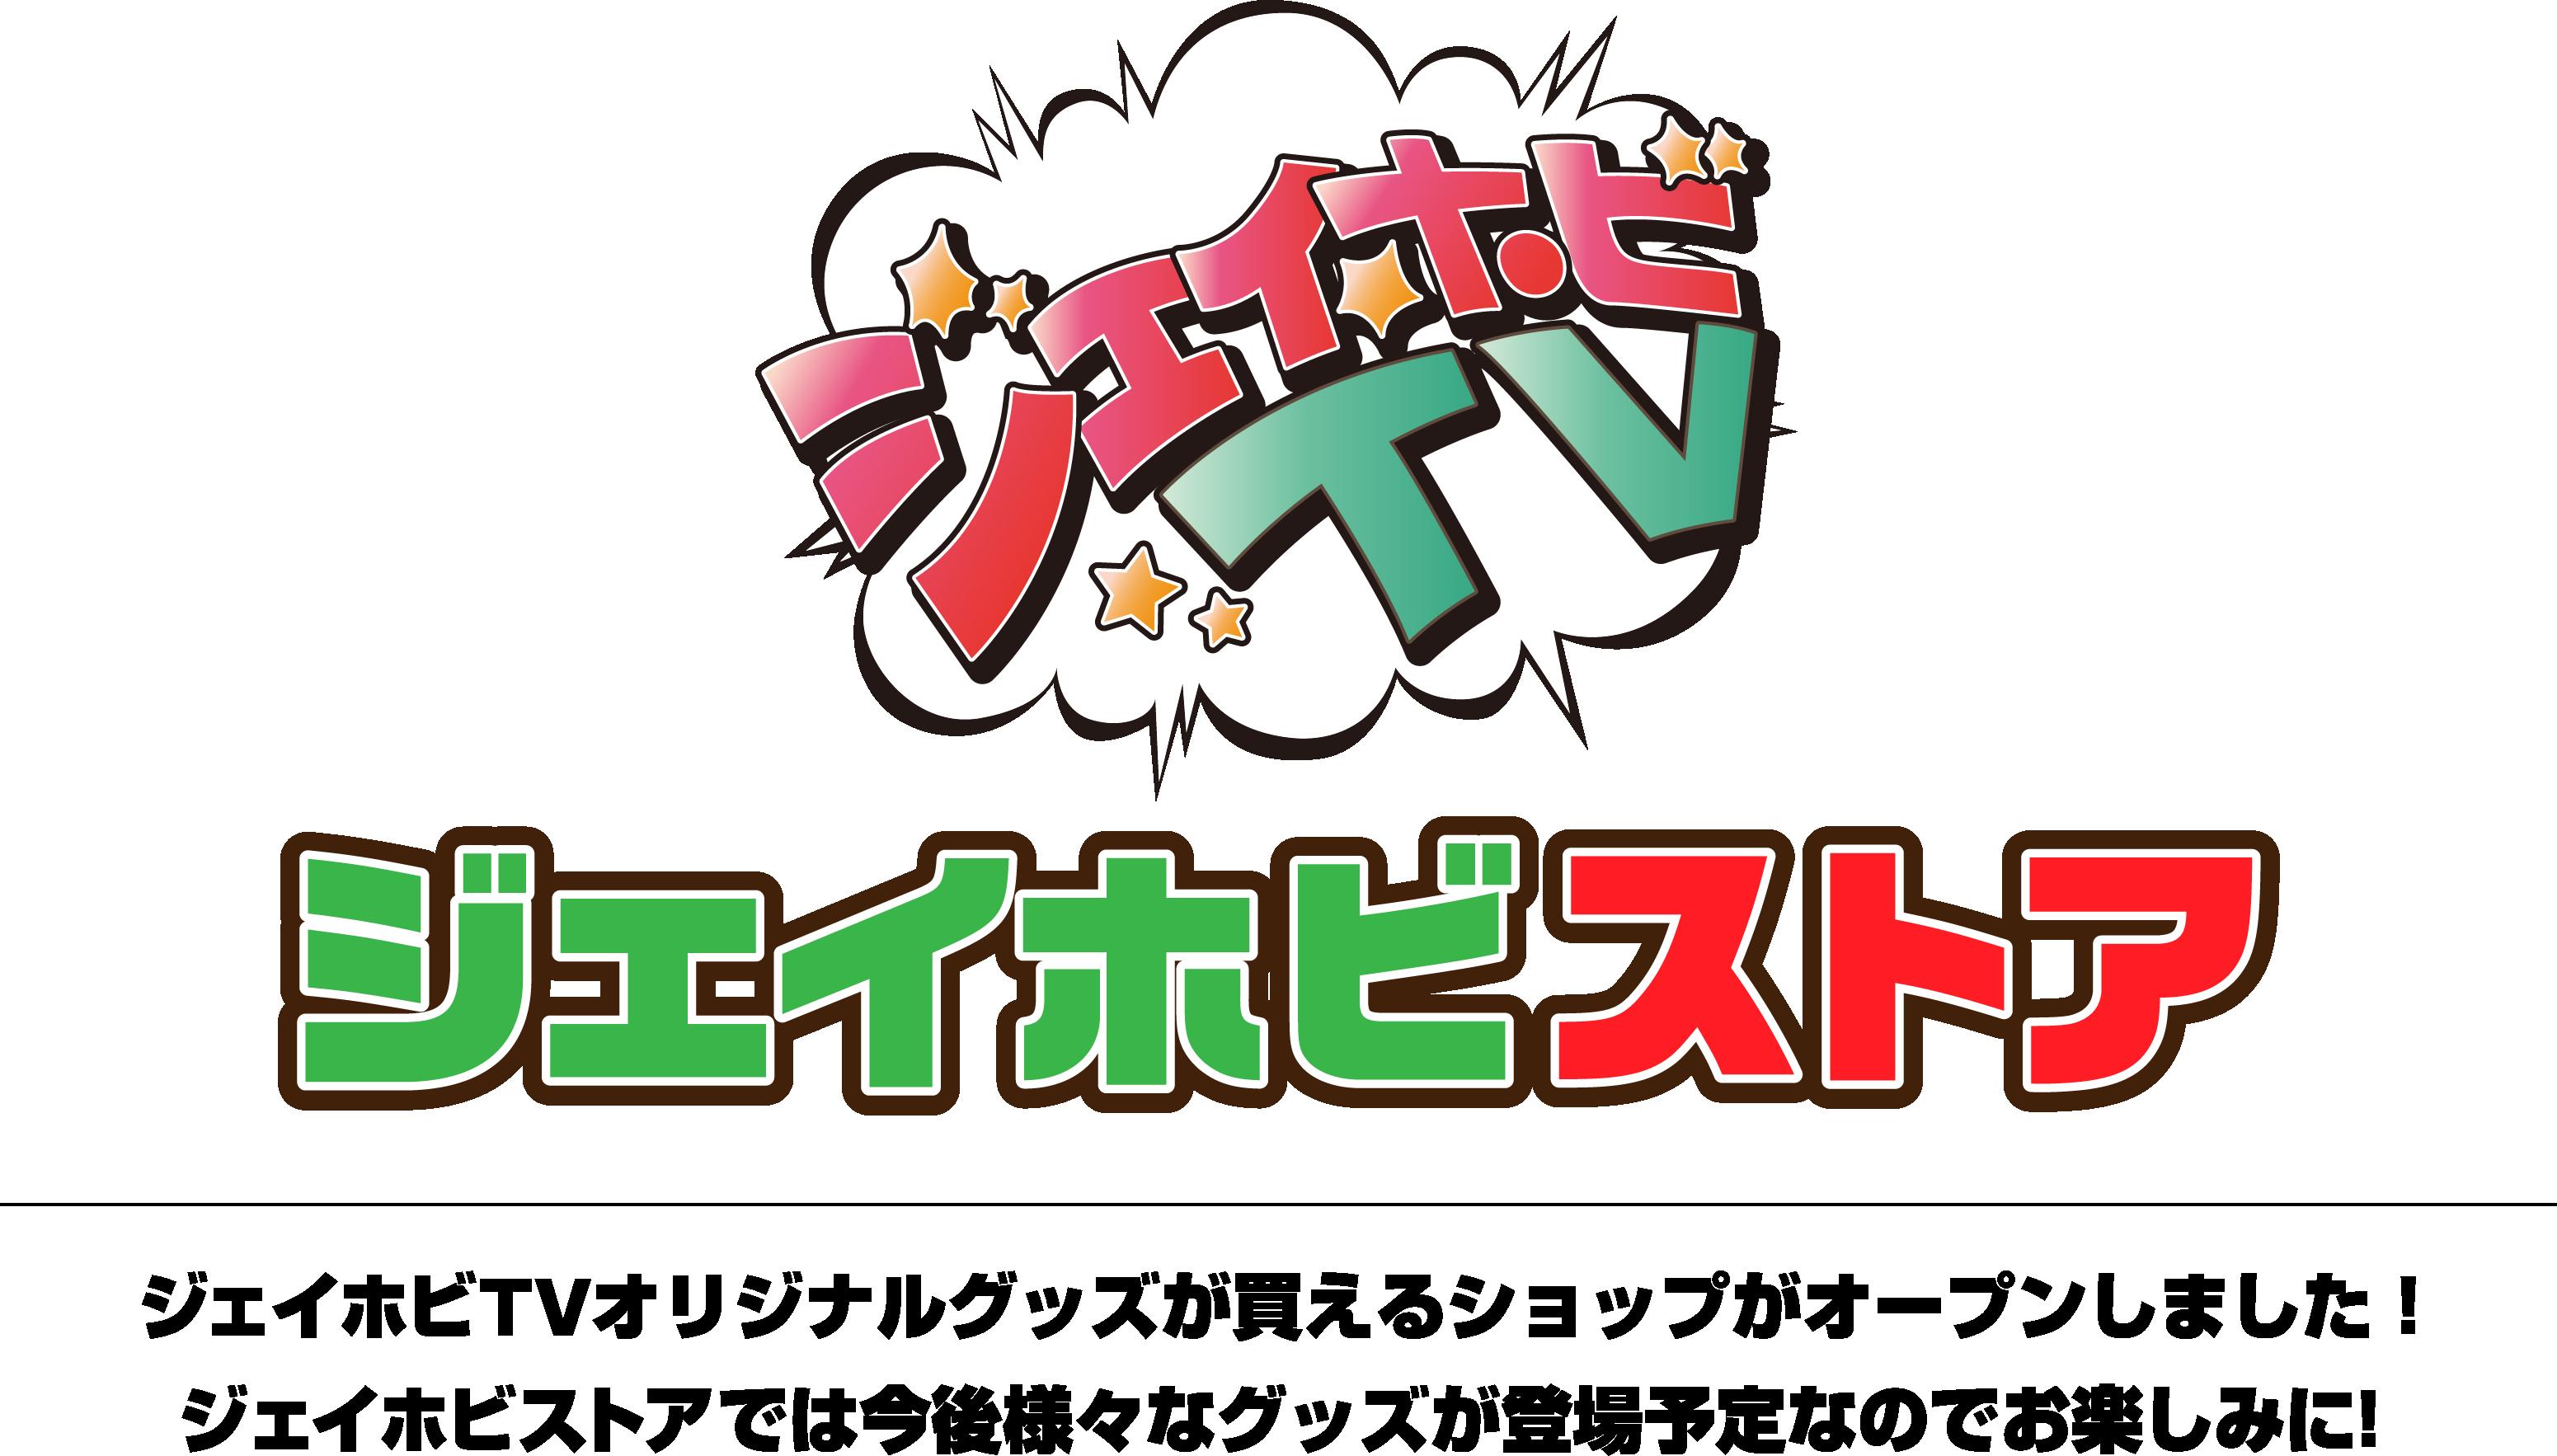 Tv ジェイホビ 【6個入】ジェイホビ台座S【パクパクさん】